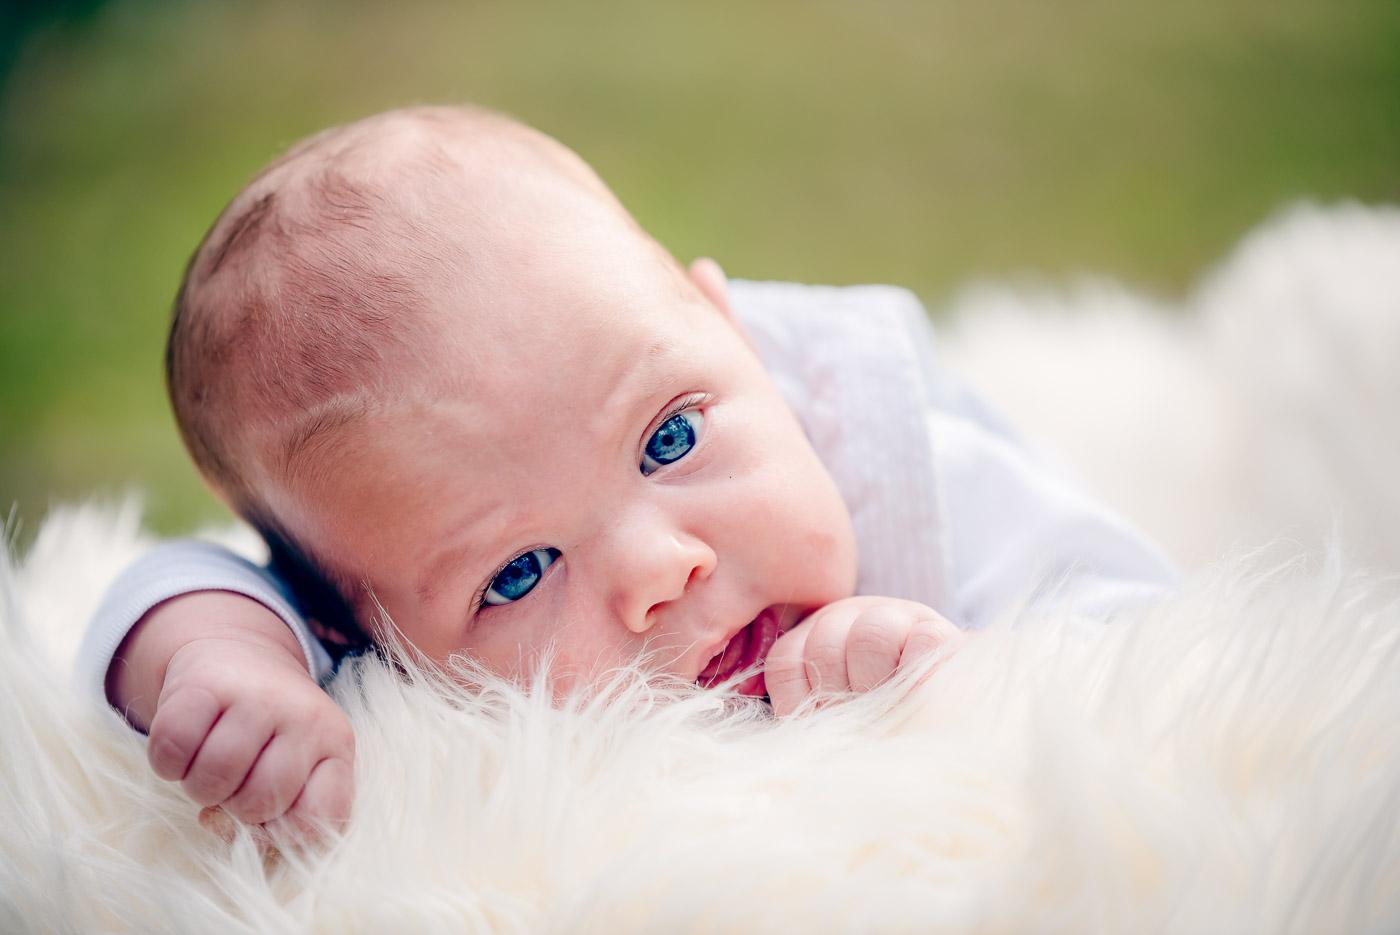 Newborn baby with amazing blue blue eyes lying on the fluffy white blanket